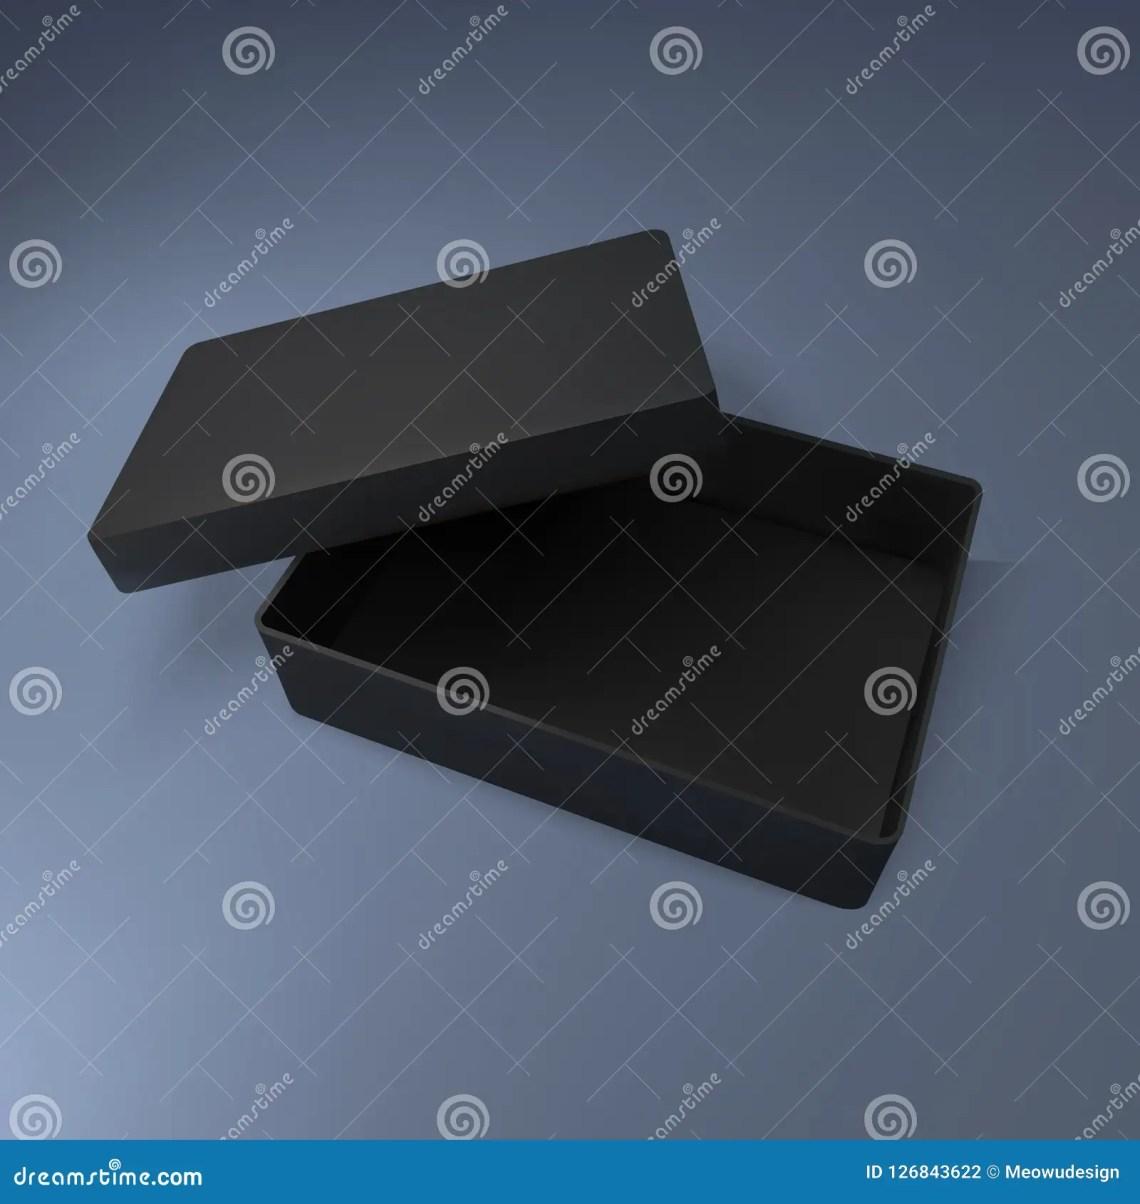 Download Black Box Mockup, Vector Illustration Stock Vector ...